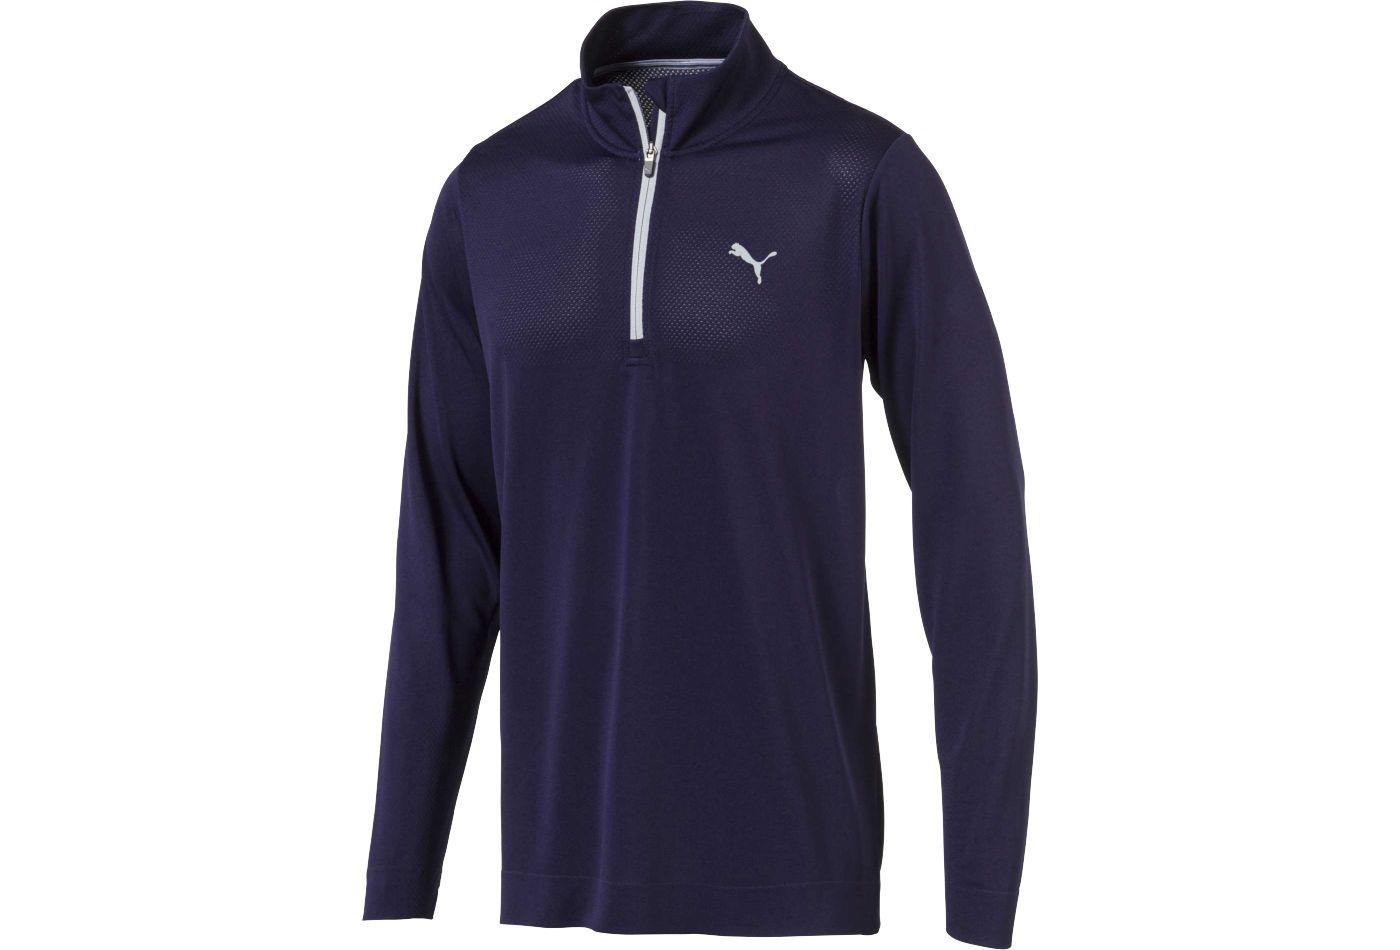 PUMA Men's Evoknit Essential Golf ¼ Zip